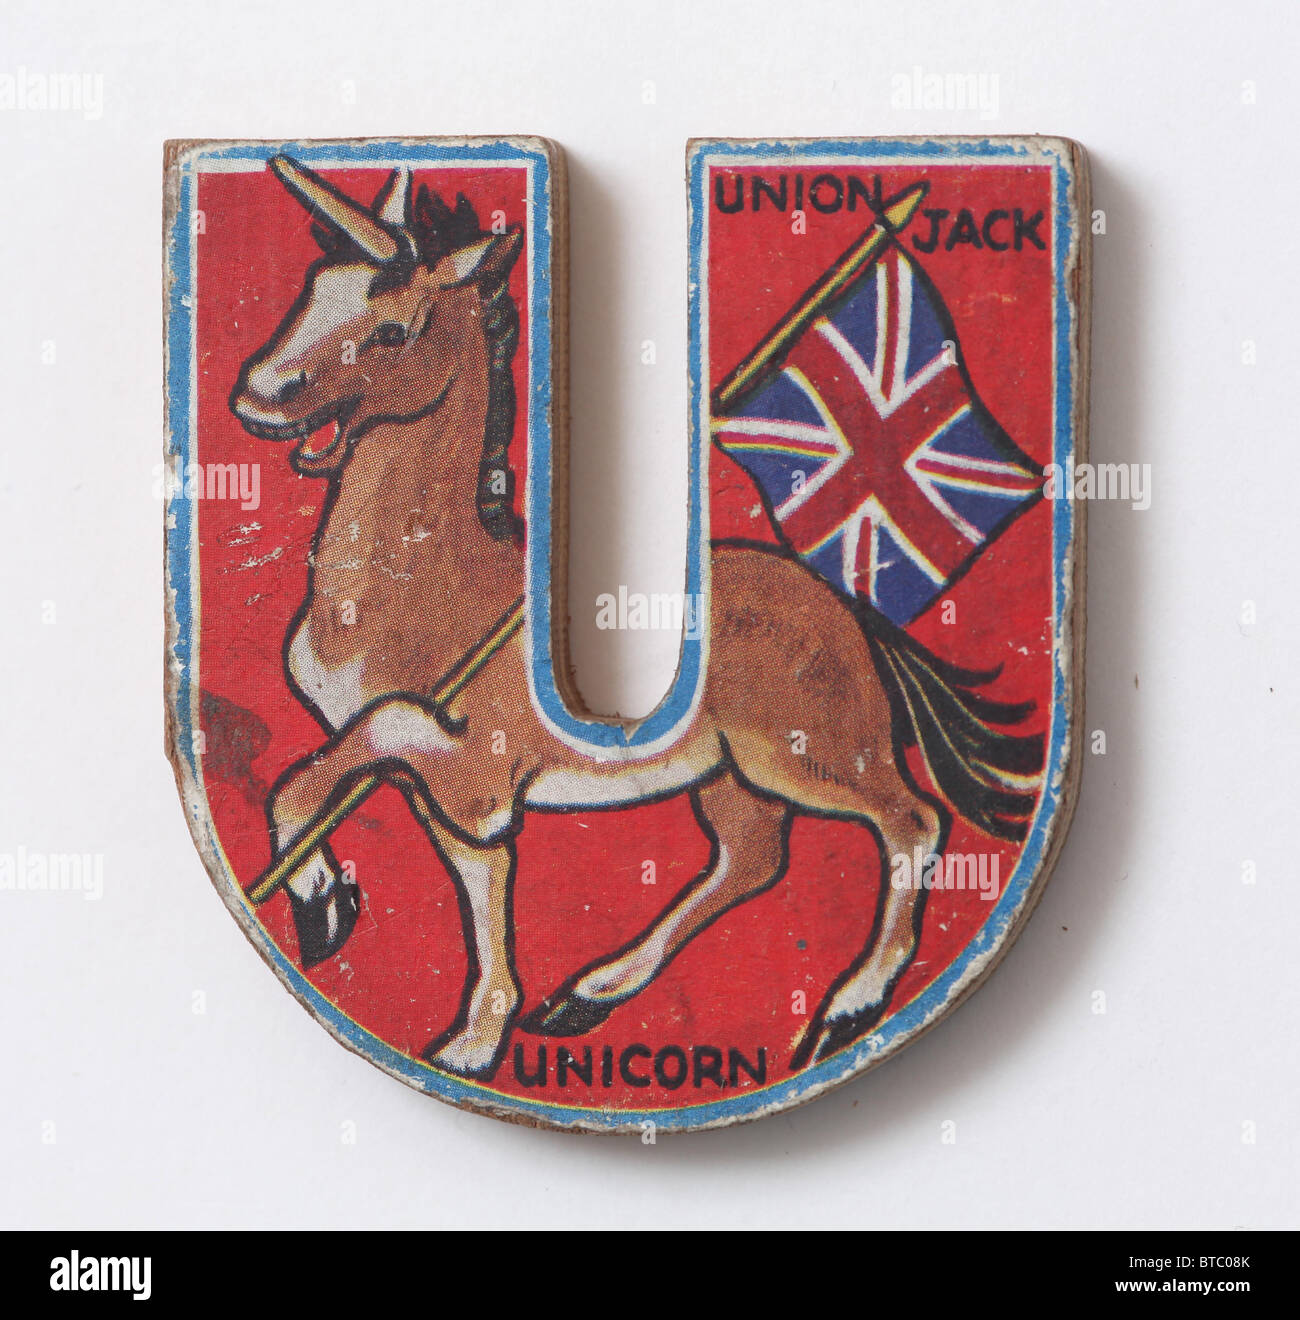 Letter U Unicorn Stock Photos Amp Letter U Unicorn Stock